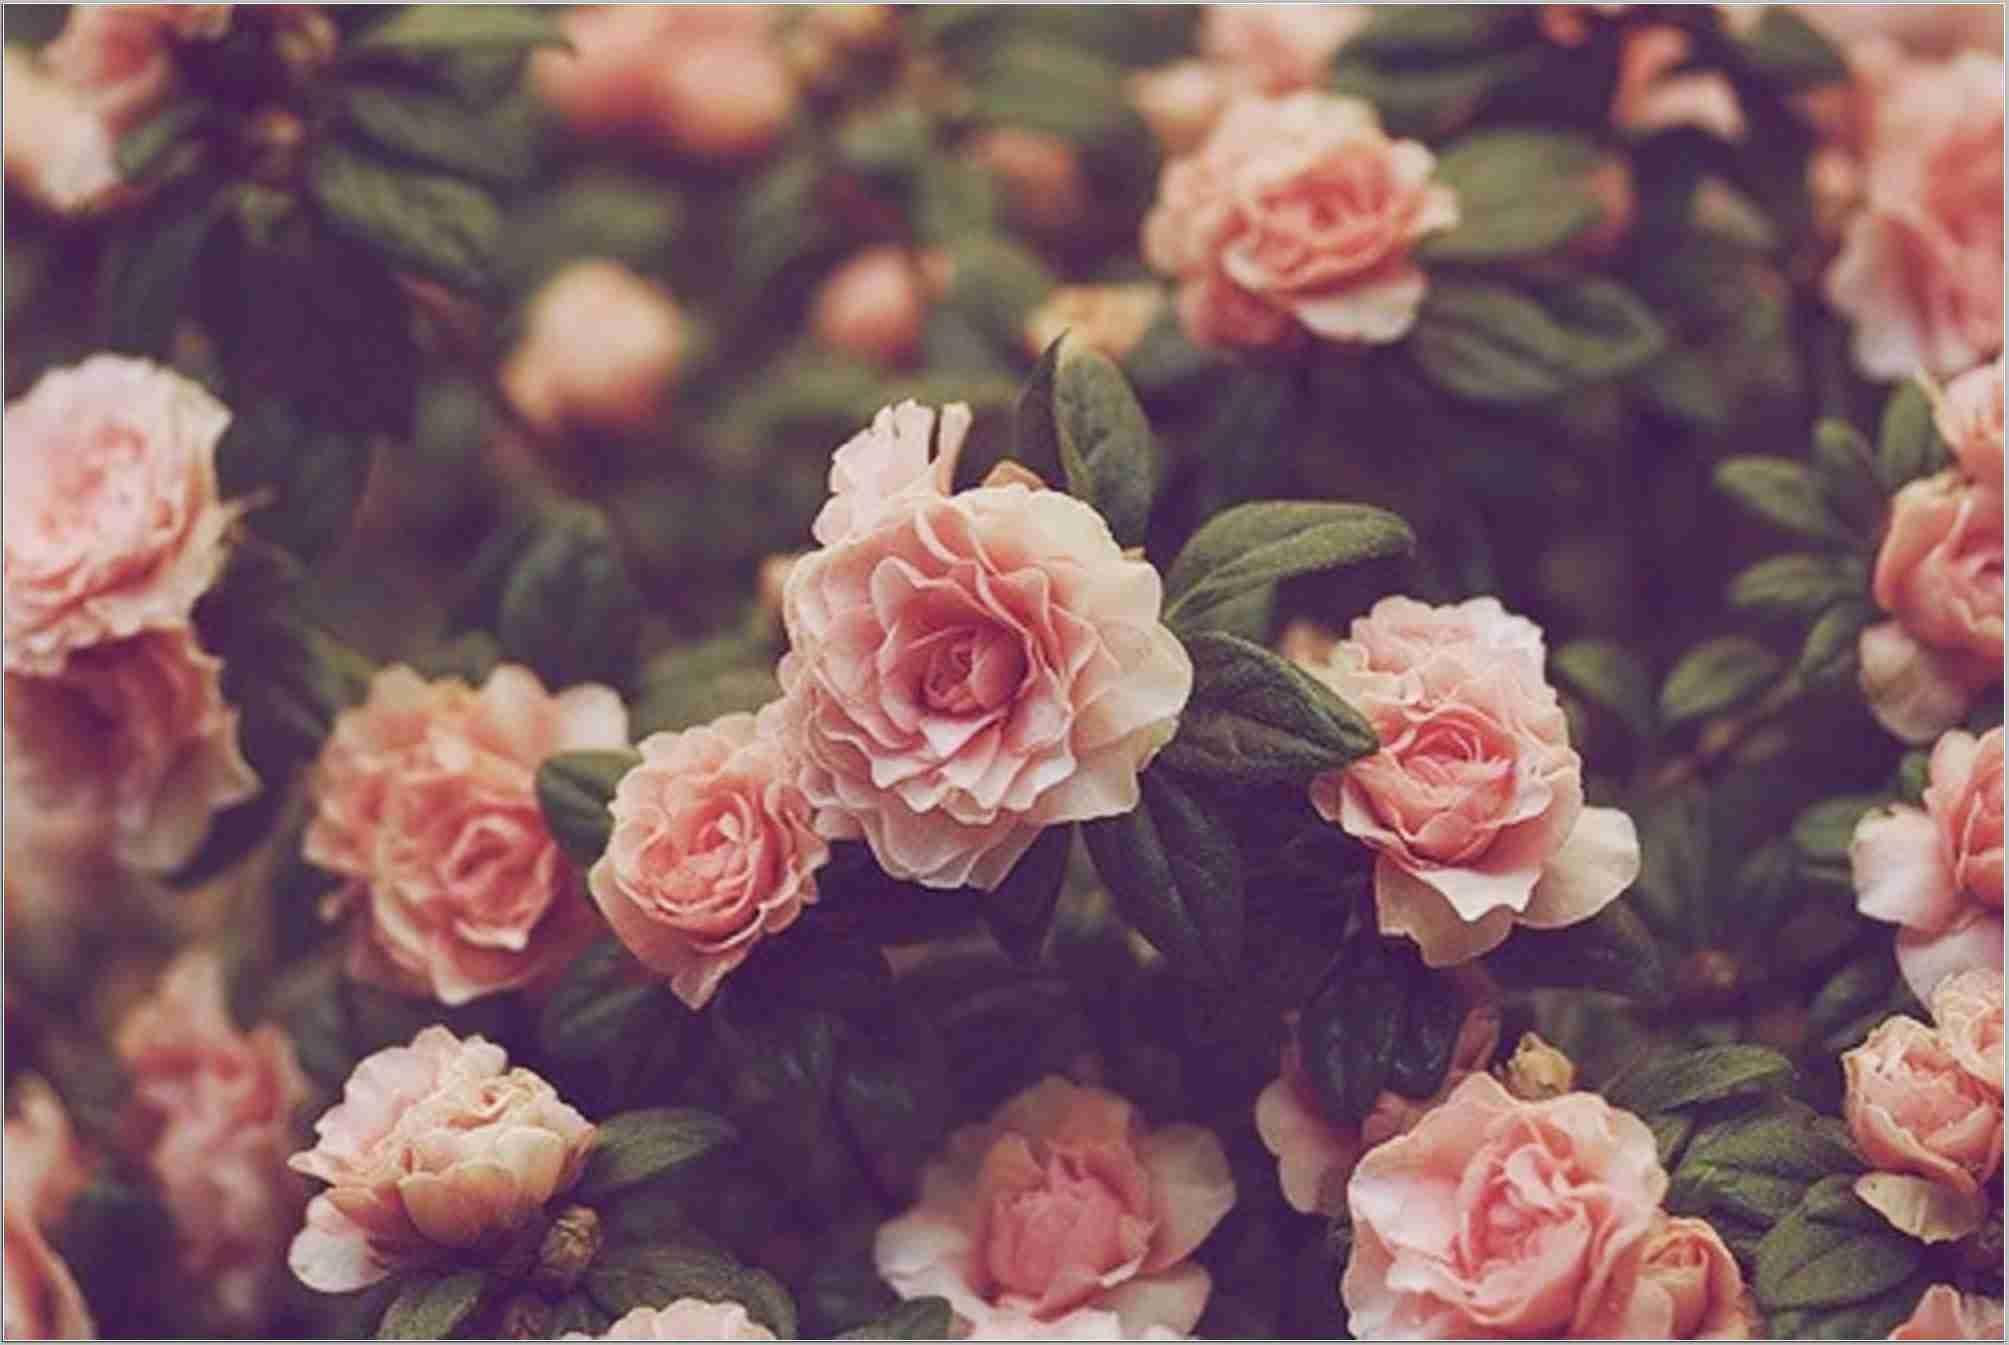 Hd Iphone Wallpapers Flowers Flower Flowers Wallpaper Wallpapers Vintage Flowers Wallpaper Vintage Flower Backgrounds Flower Backgrounds